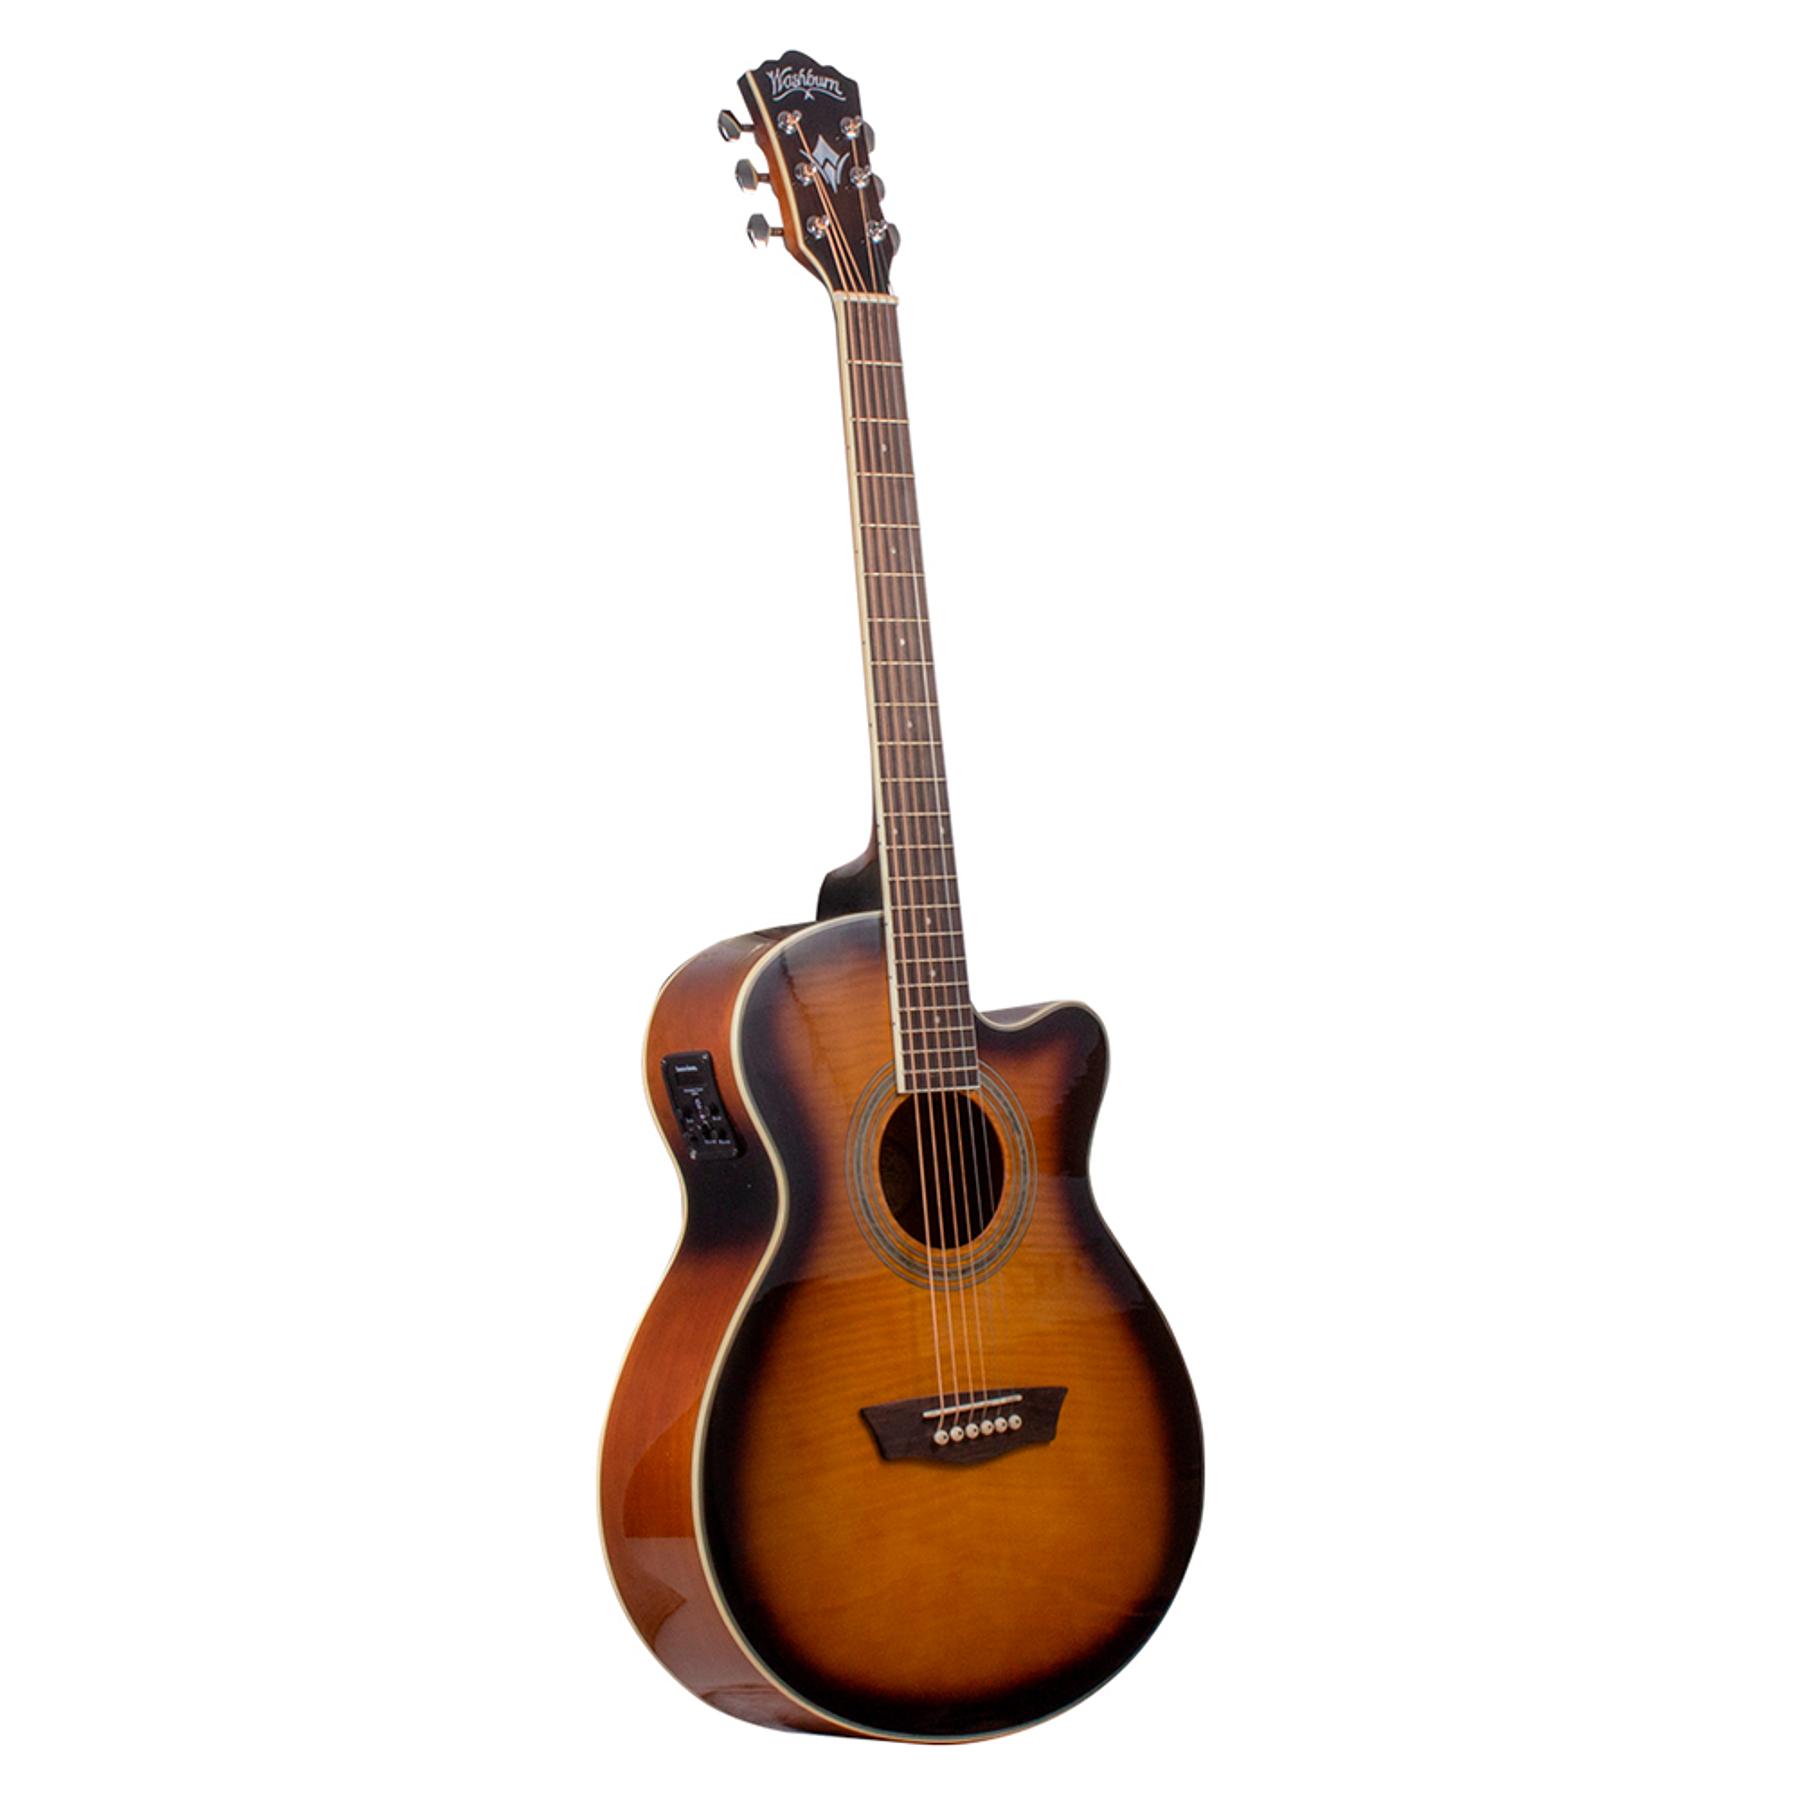 Guitarra Electroacústica EA15ATB Washburn, color Café